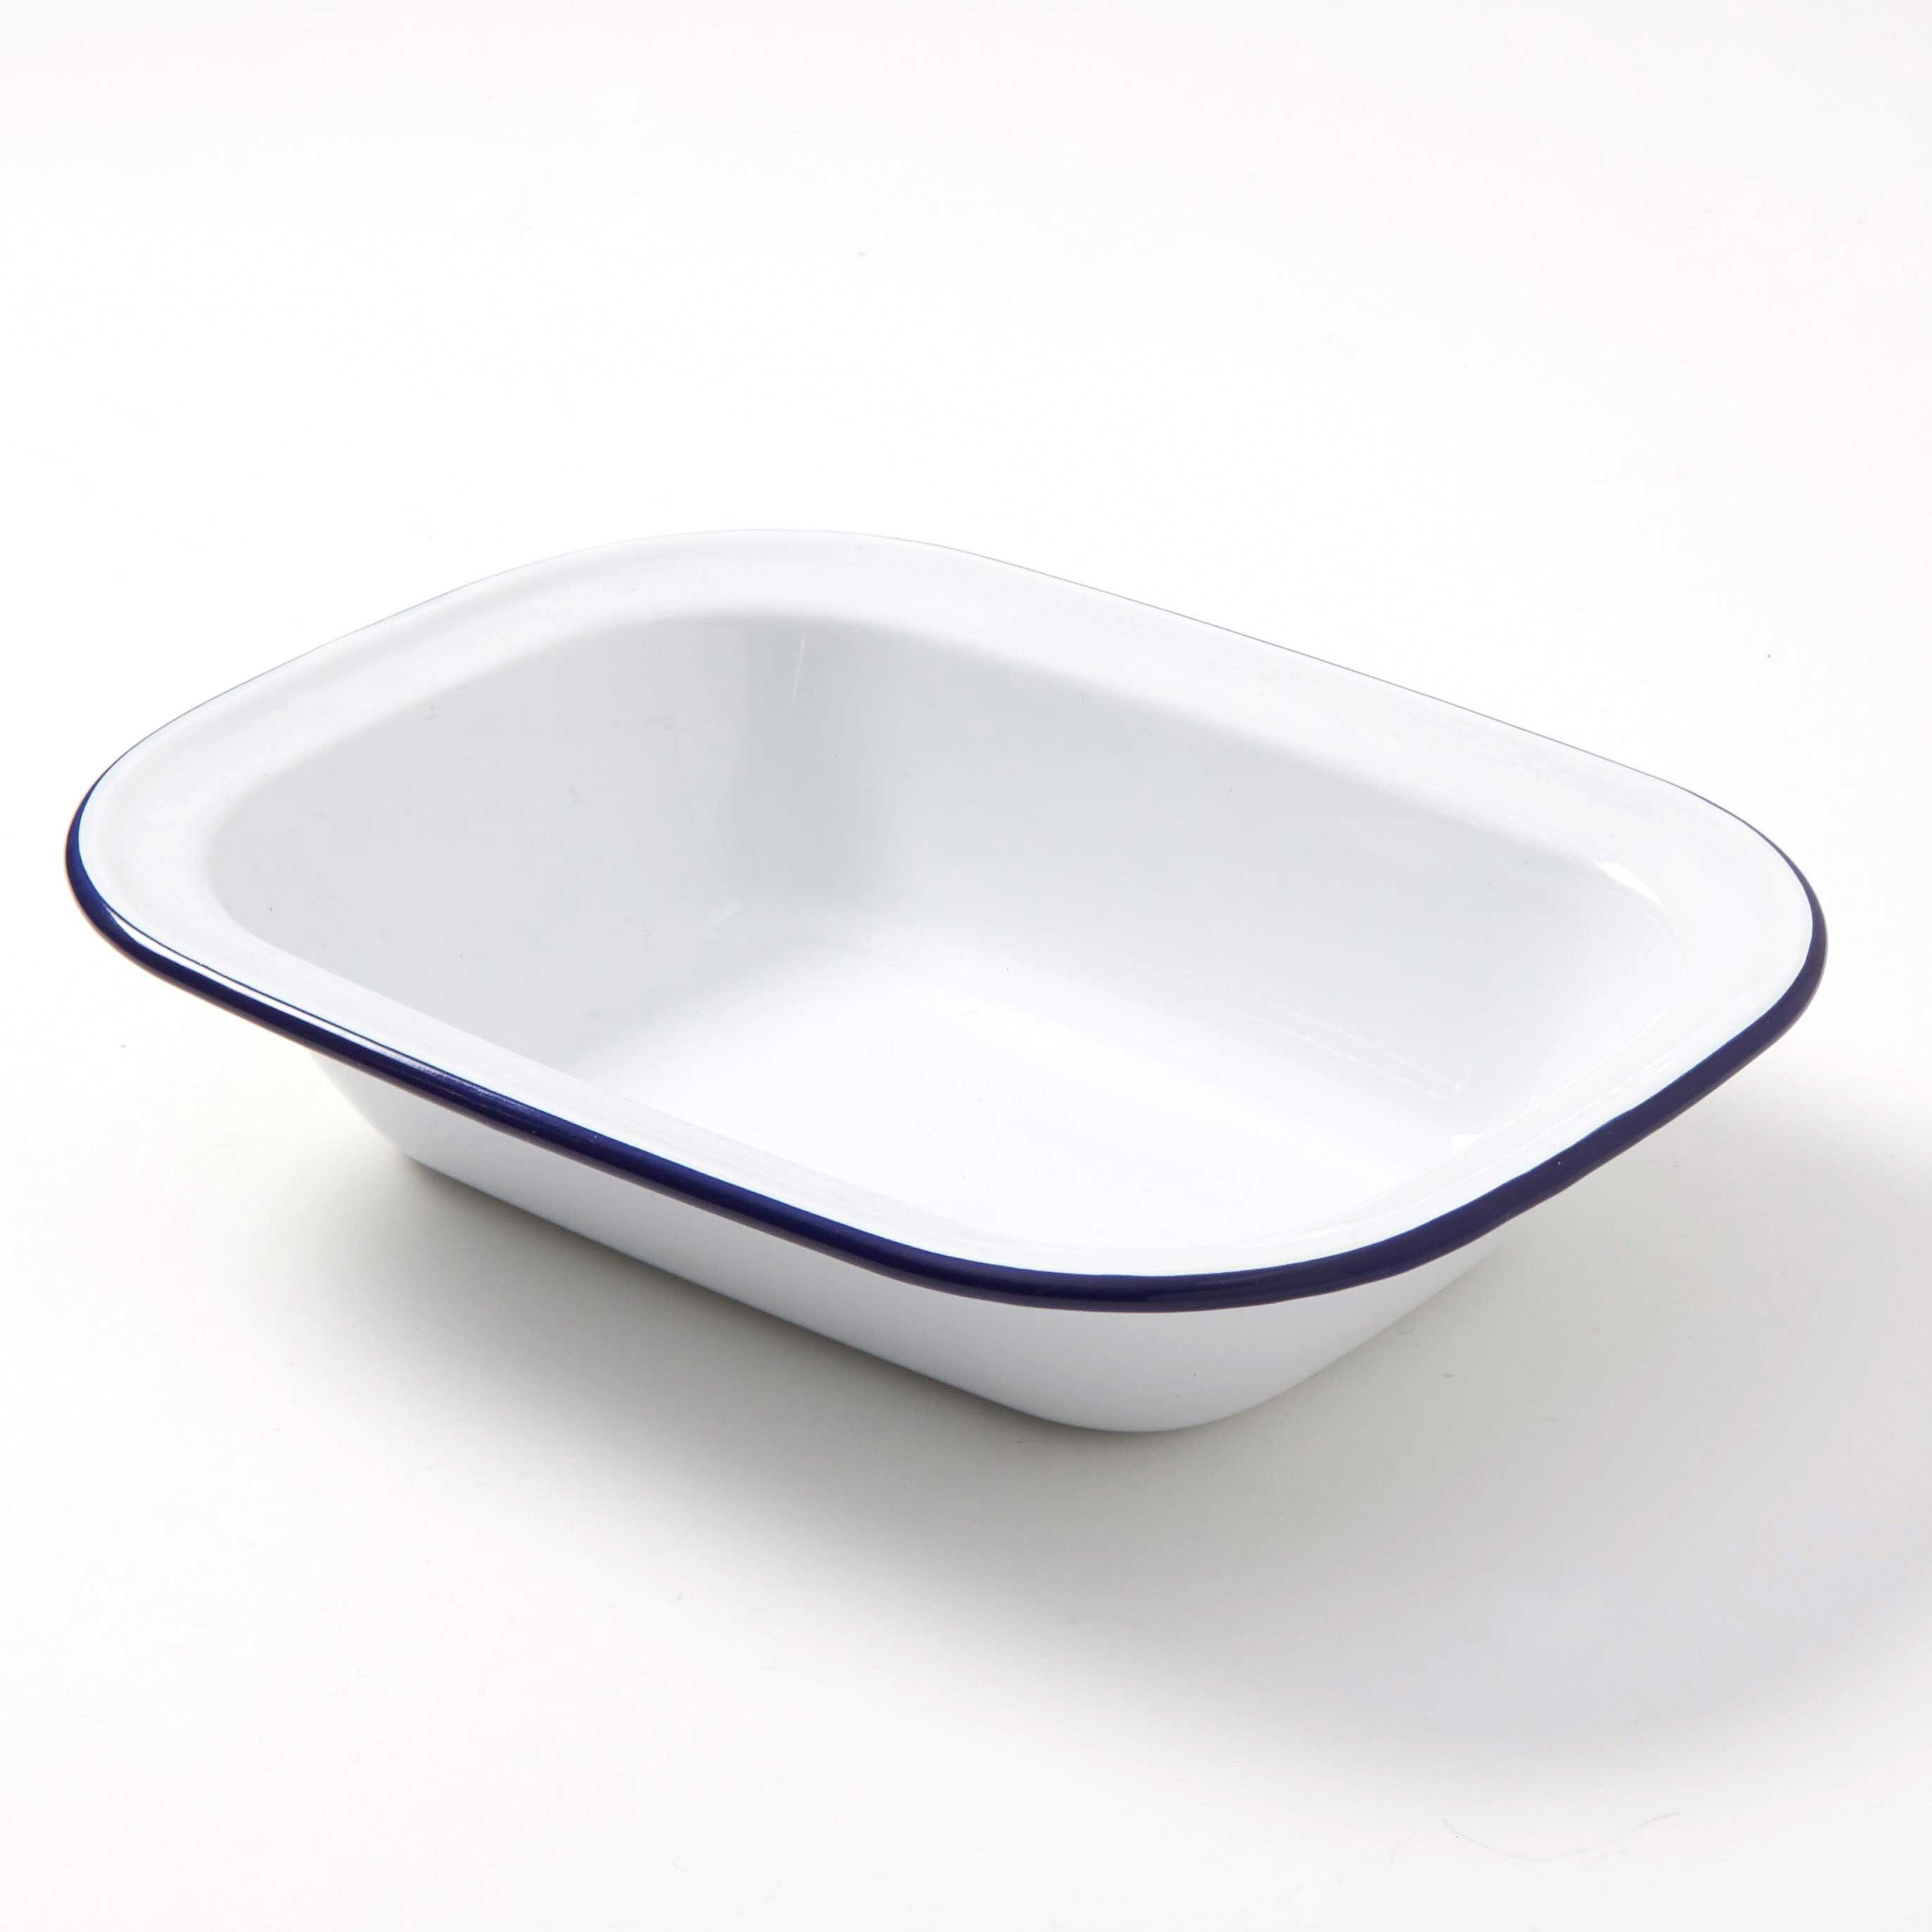 American Metalcraft EWB10 bowl, metal,  1 - 2 qt (32 - 95 oz)